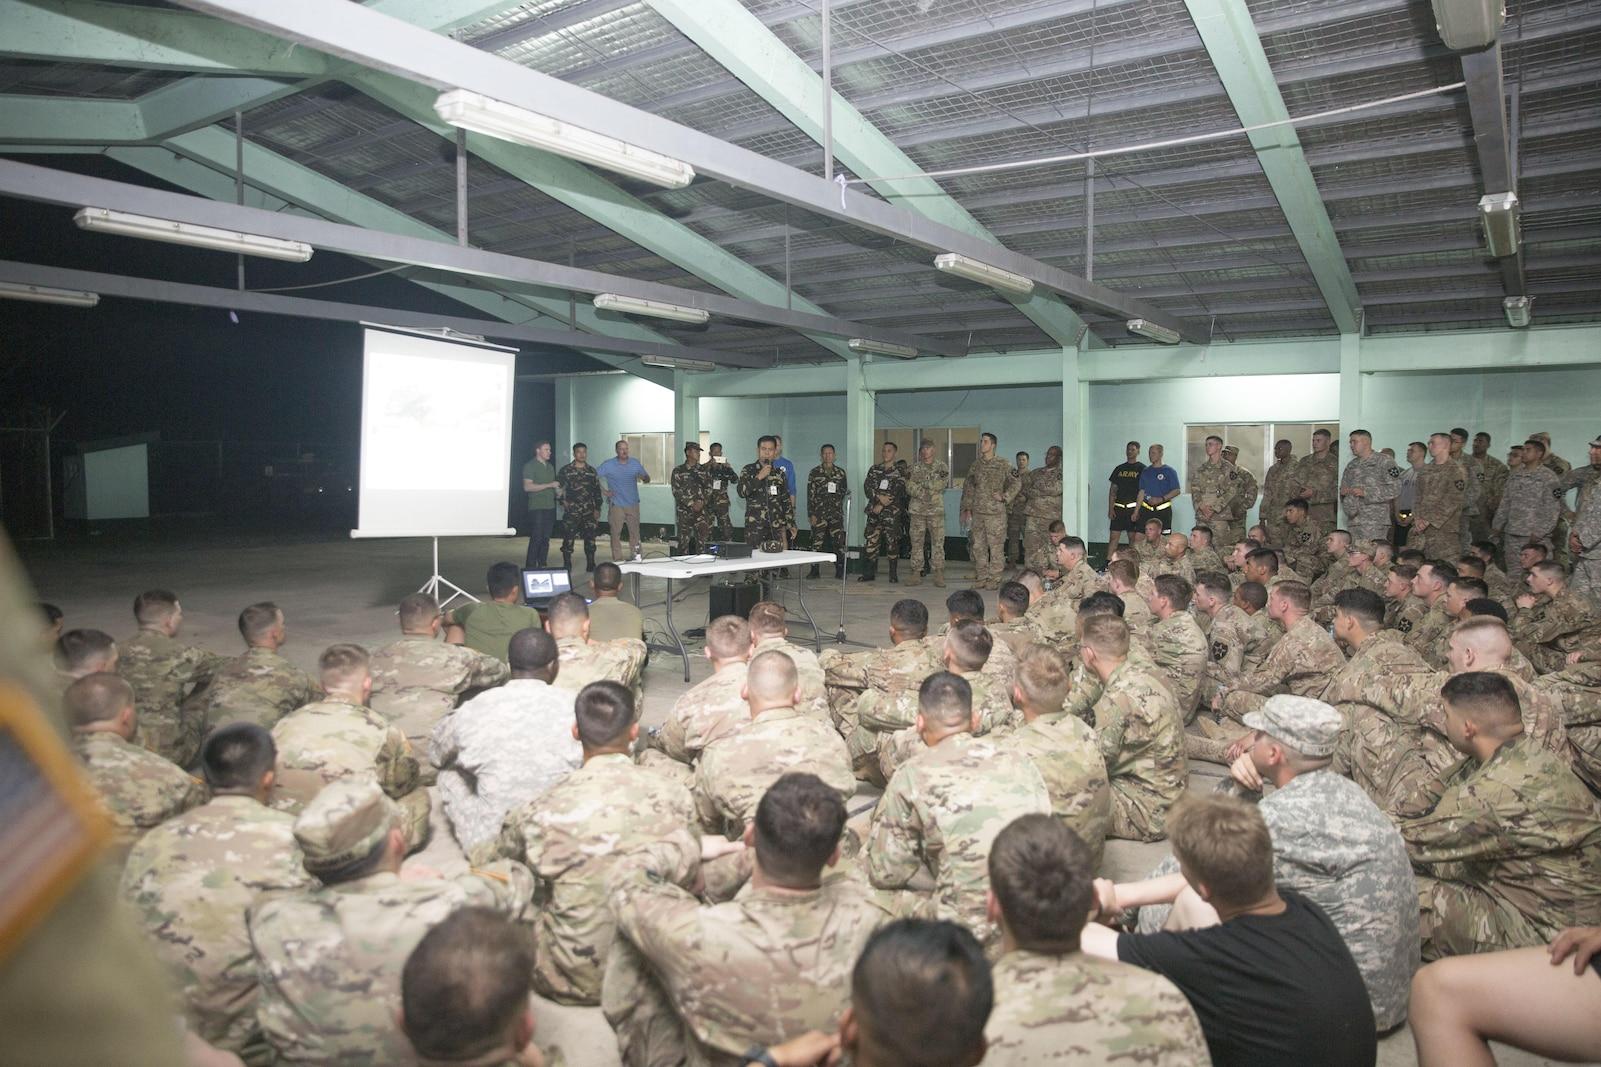 Philippine Army Col. TonyFlorendo briefs U.S. Soldiers about Balikatan 2017 at Fort Magsaysay in Santa Rosa, Nueva Ecija, May 3, 2017.